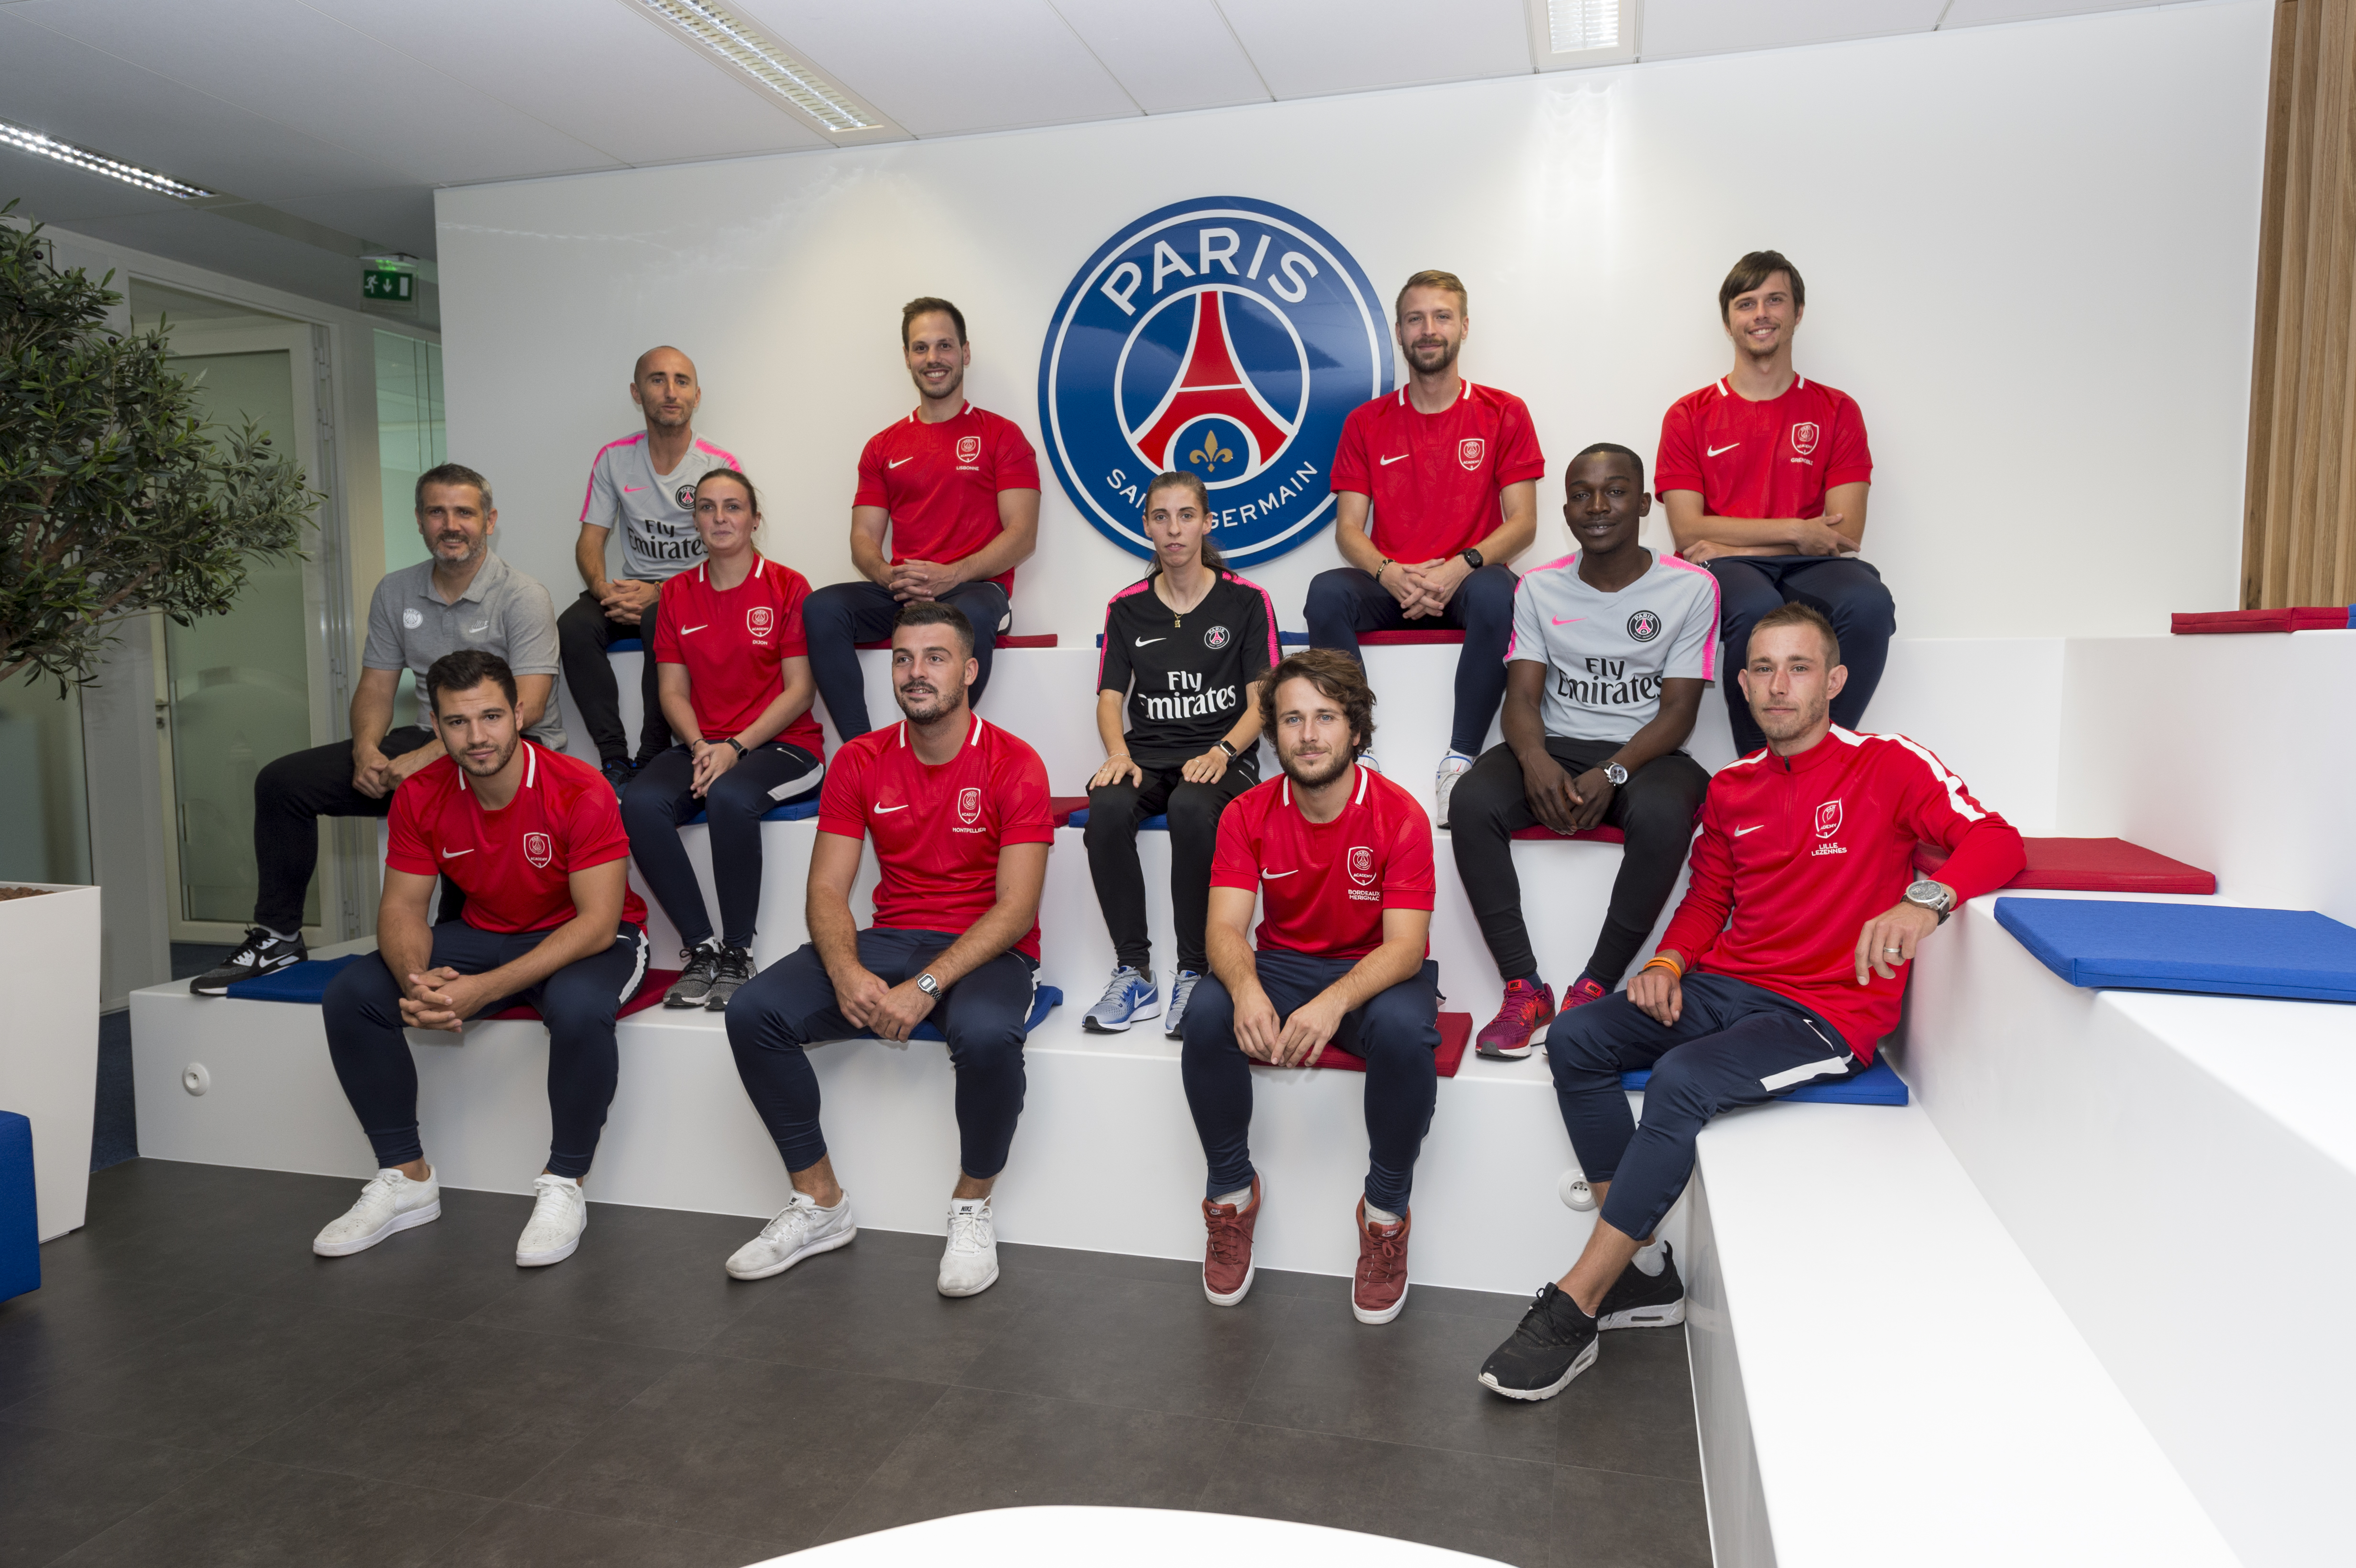 FORMATION COACH PSG ACADEMY - Paris Saint-Germain Academy